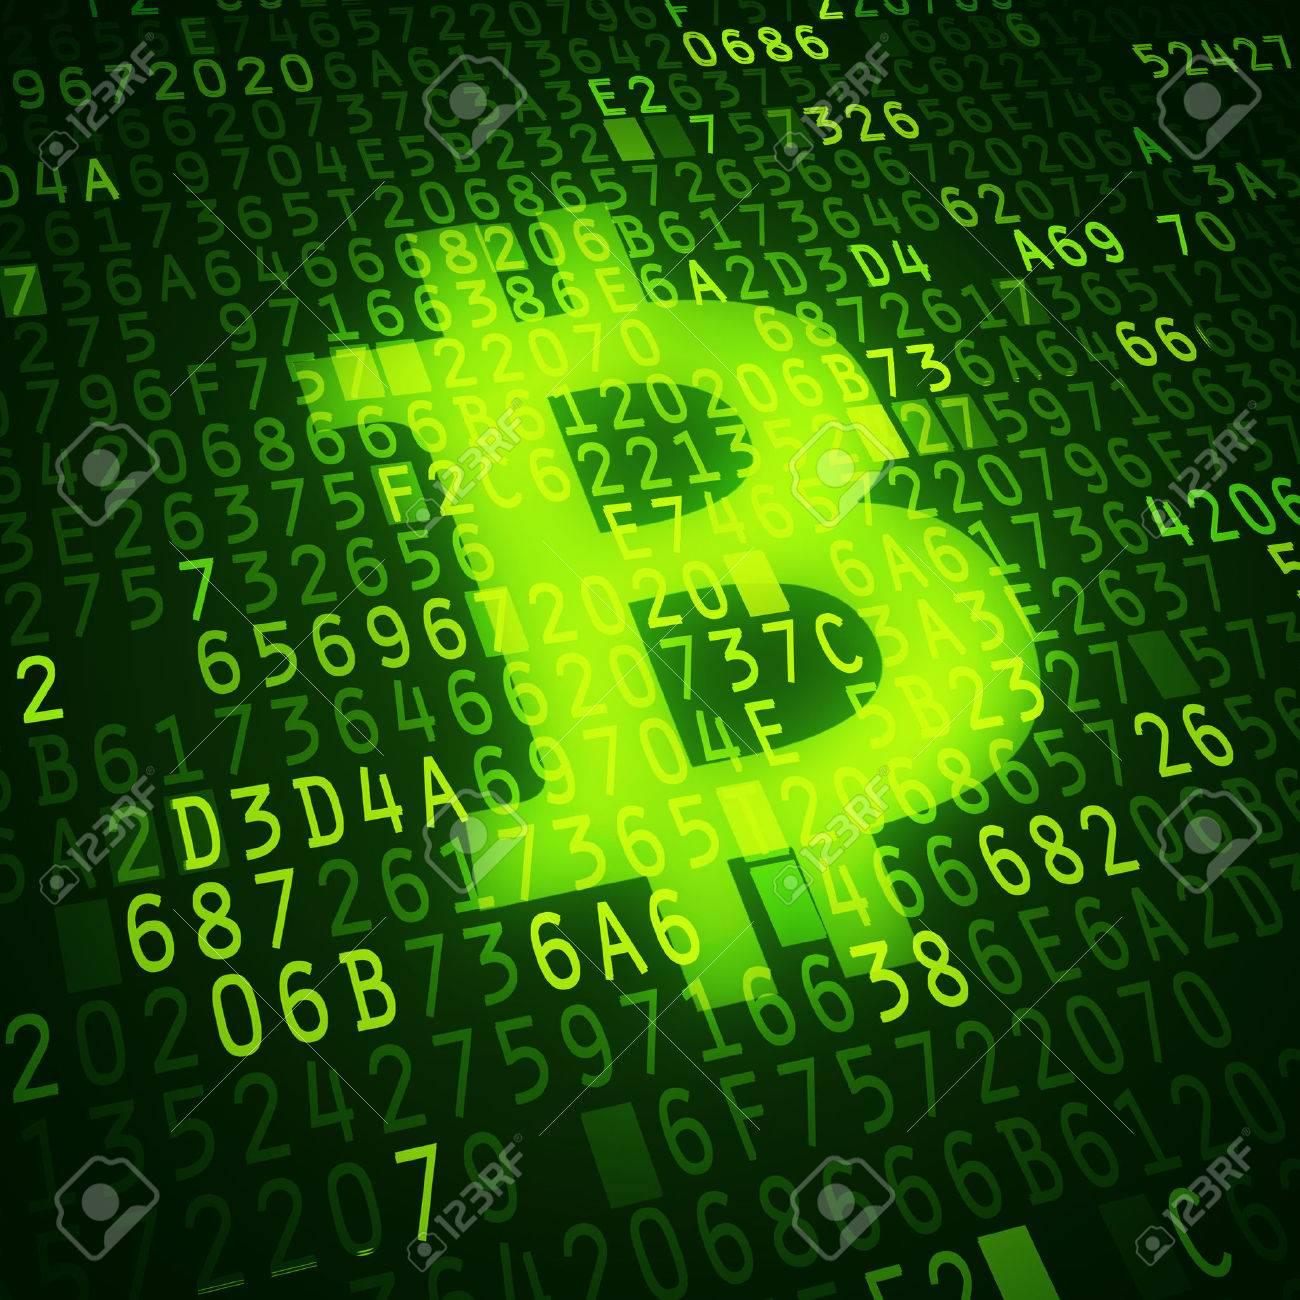 Bit coin symbol as virtual currency symbol Conceptual image - 25824522